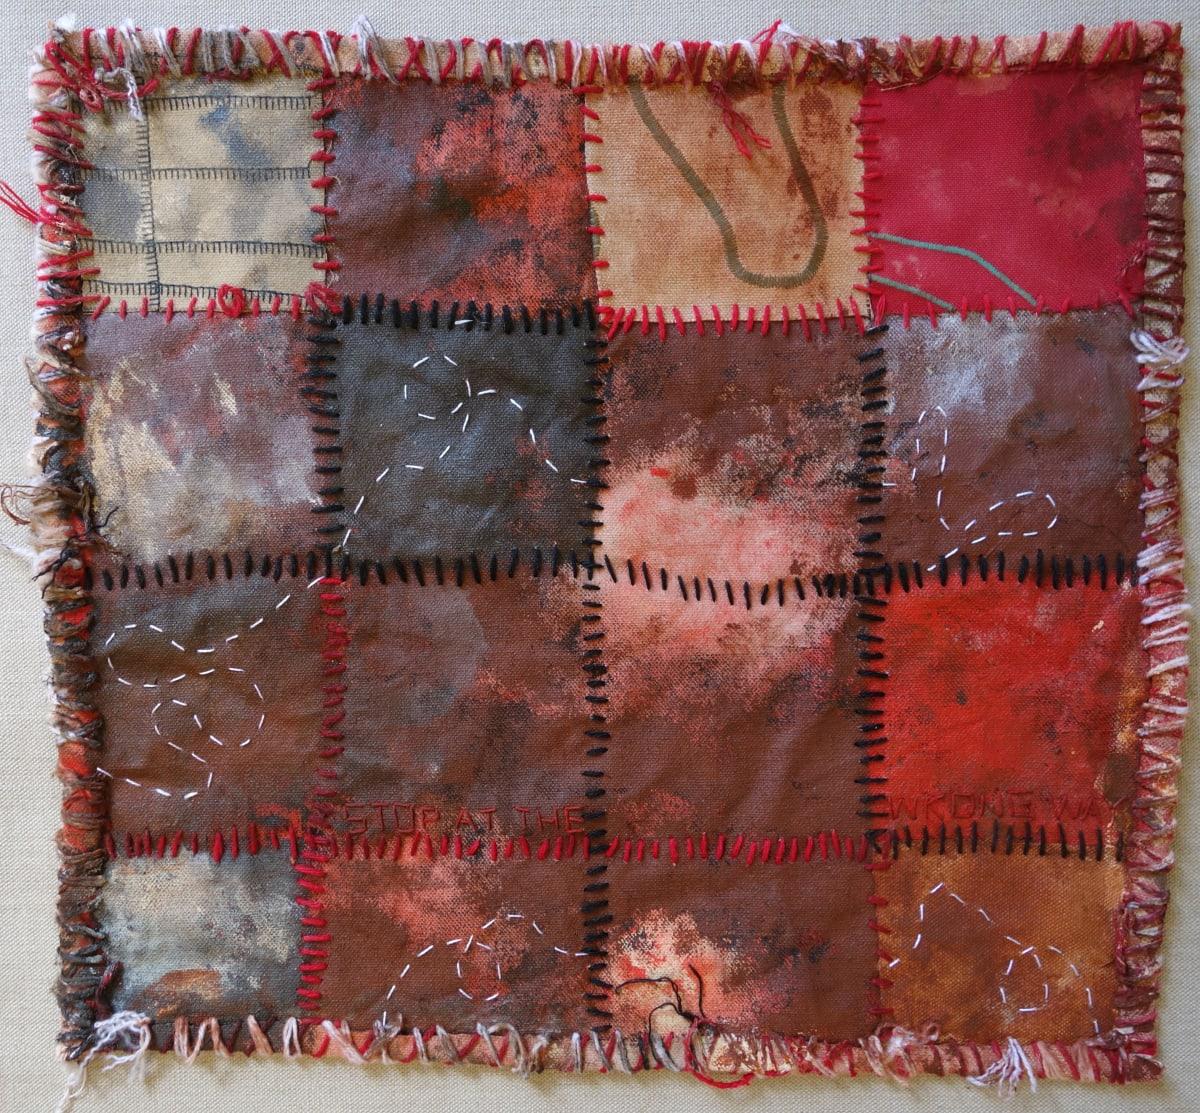 Stephen Eastaugh MUDMAPS 6 (Stop at the wrong way) Broome acrylic, thread, linen 45 x 45 cm